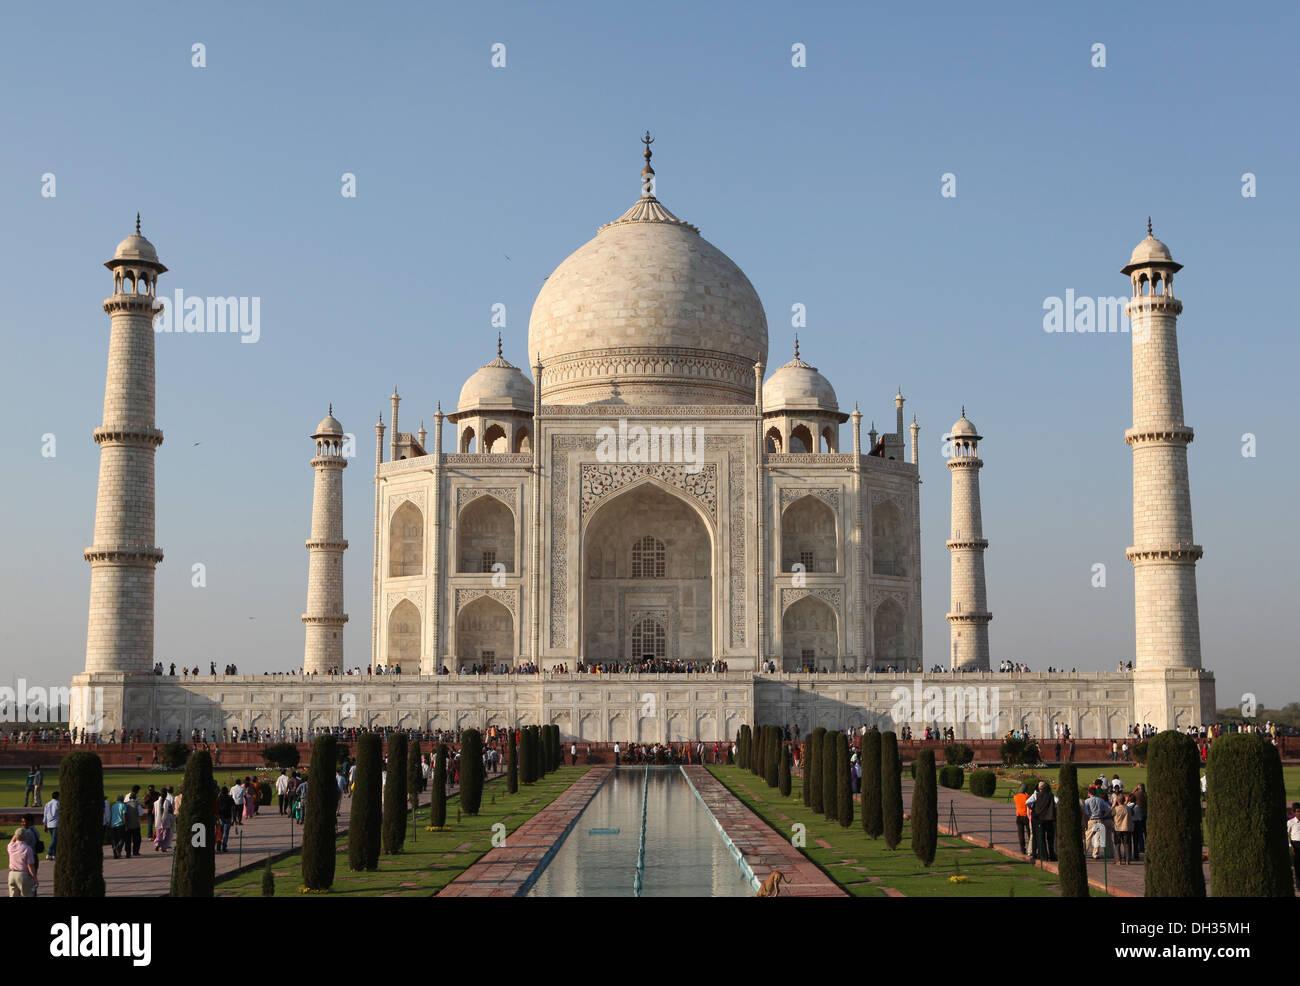 Taj Mahal, Agra, Uttar Pradesh, India, Asia Stock Photo